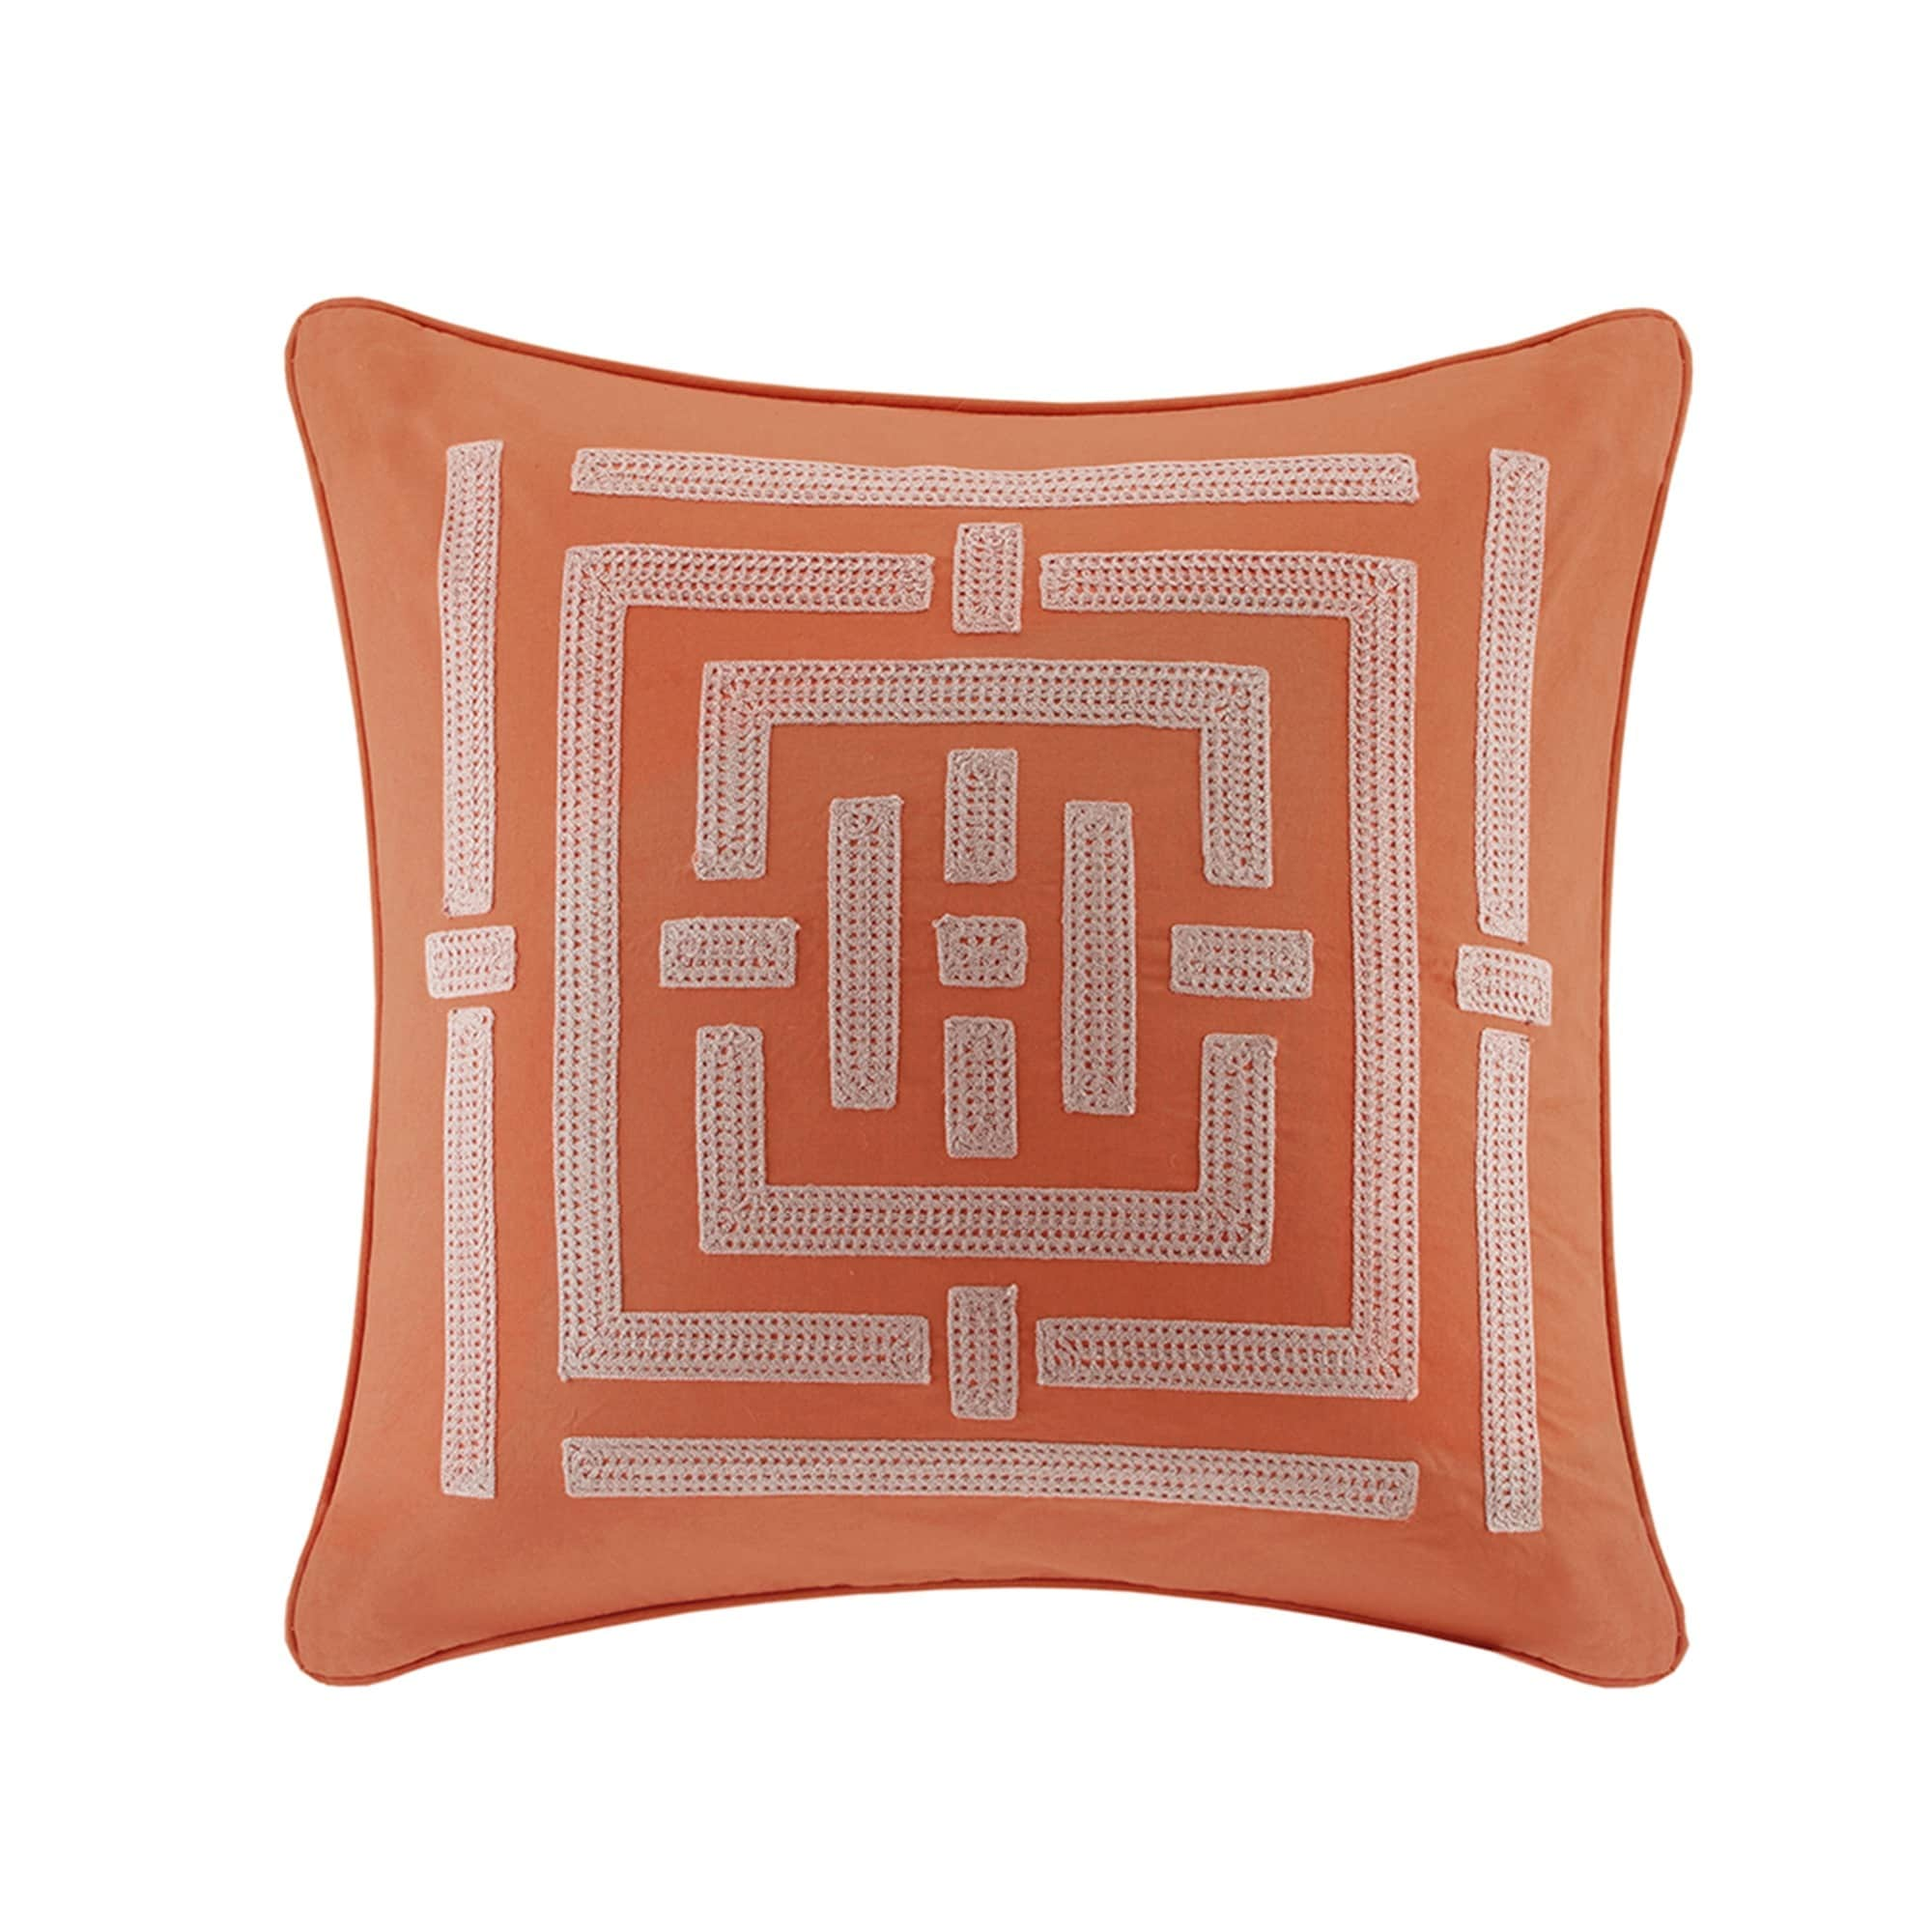 N Natori Nara Multi Embroidered Cotton Canvas Euro Sham (...